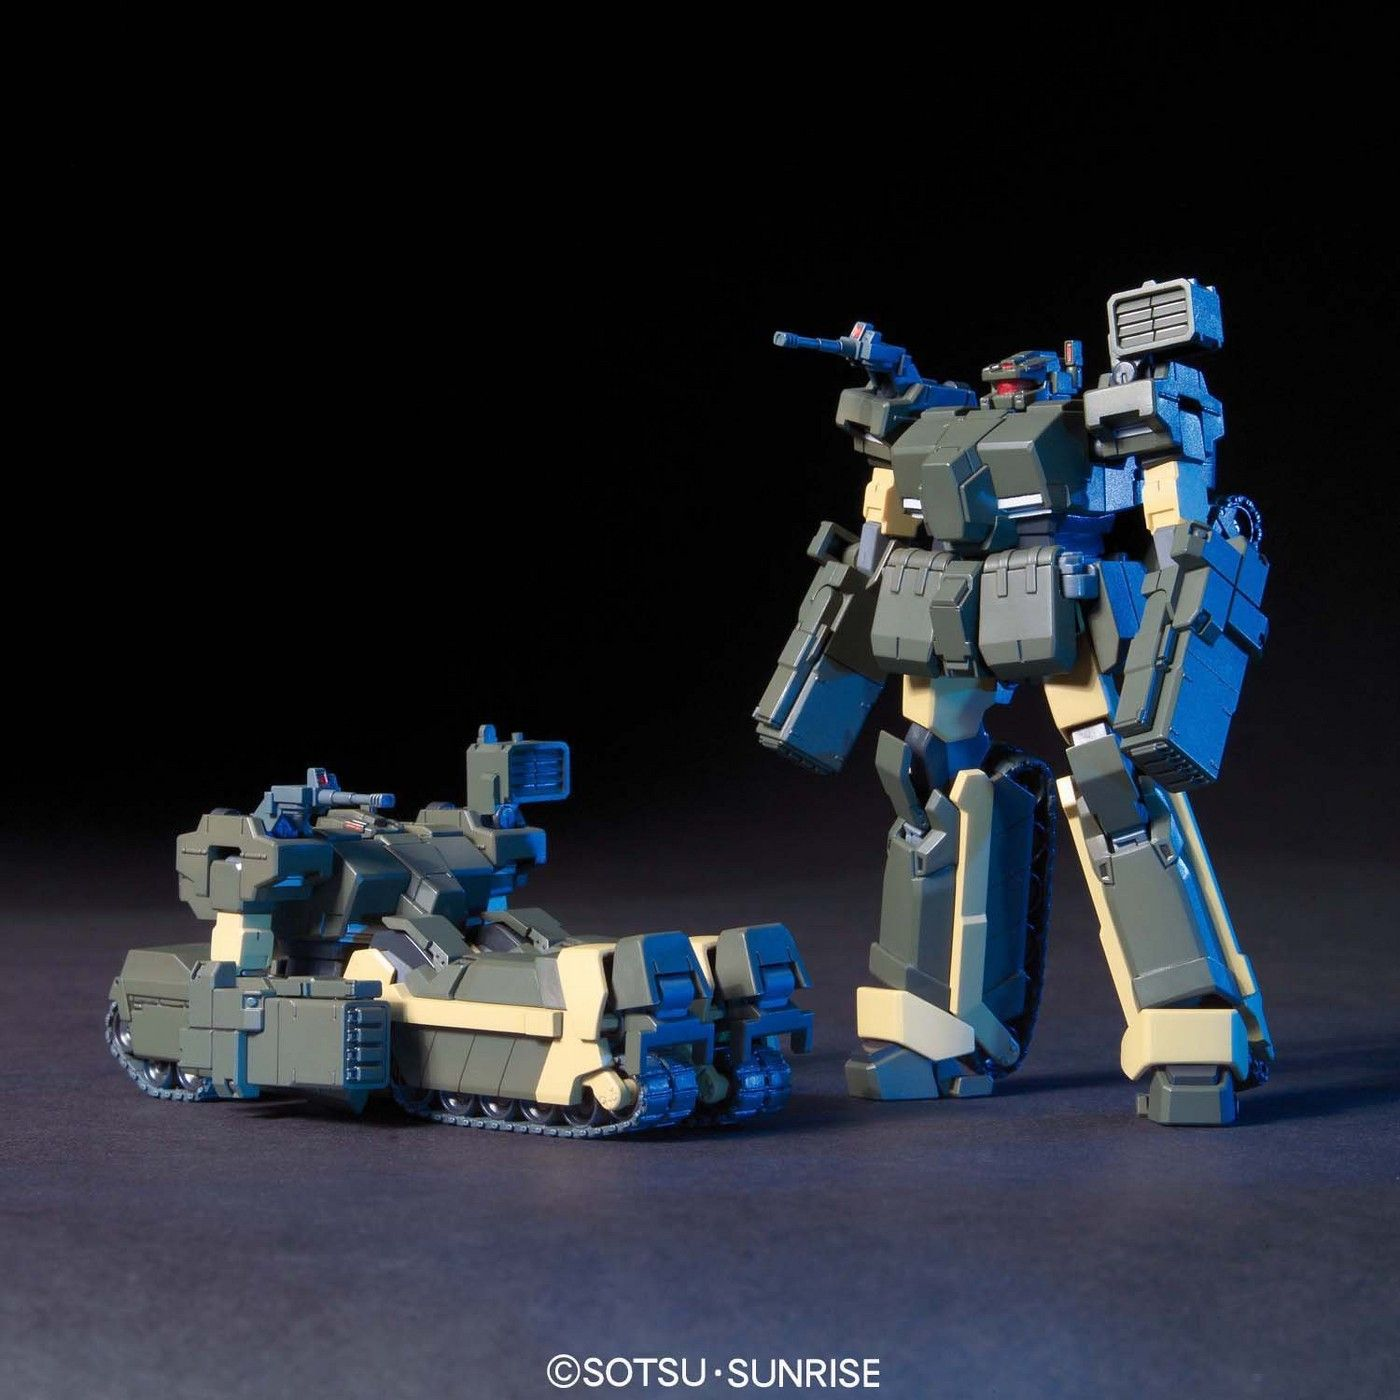 Bandai Hobby Gundam Unicorn HGUC #106 D-50C Loto Twin Set HG 1/144 Model Kit #Sponsored #HGUC, #SPONSORED, #Unicorn, #Bandai